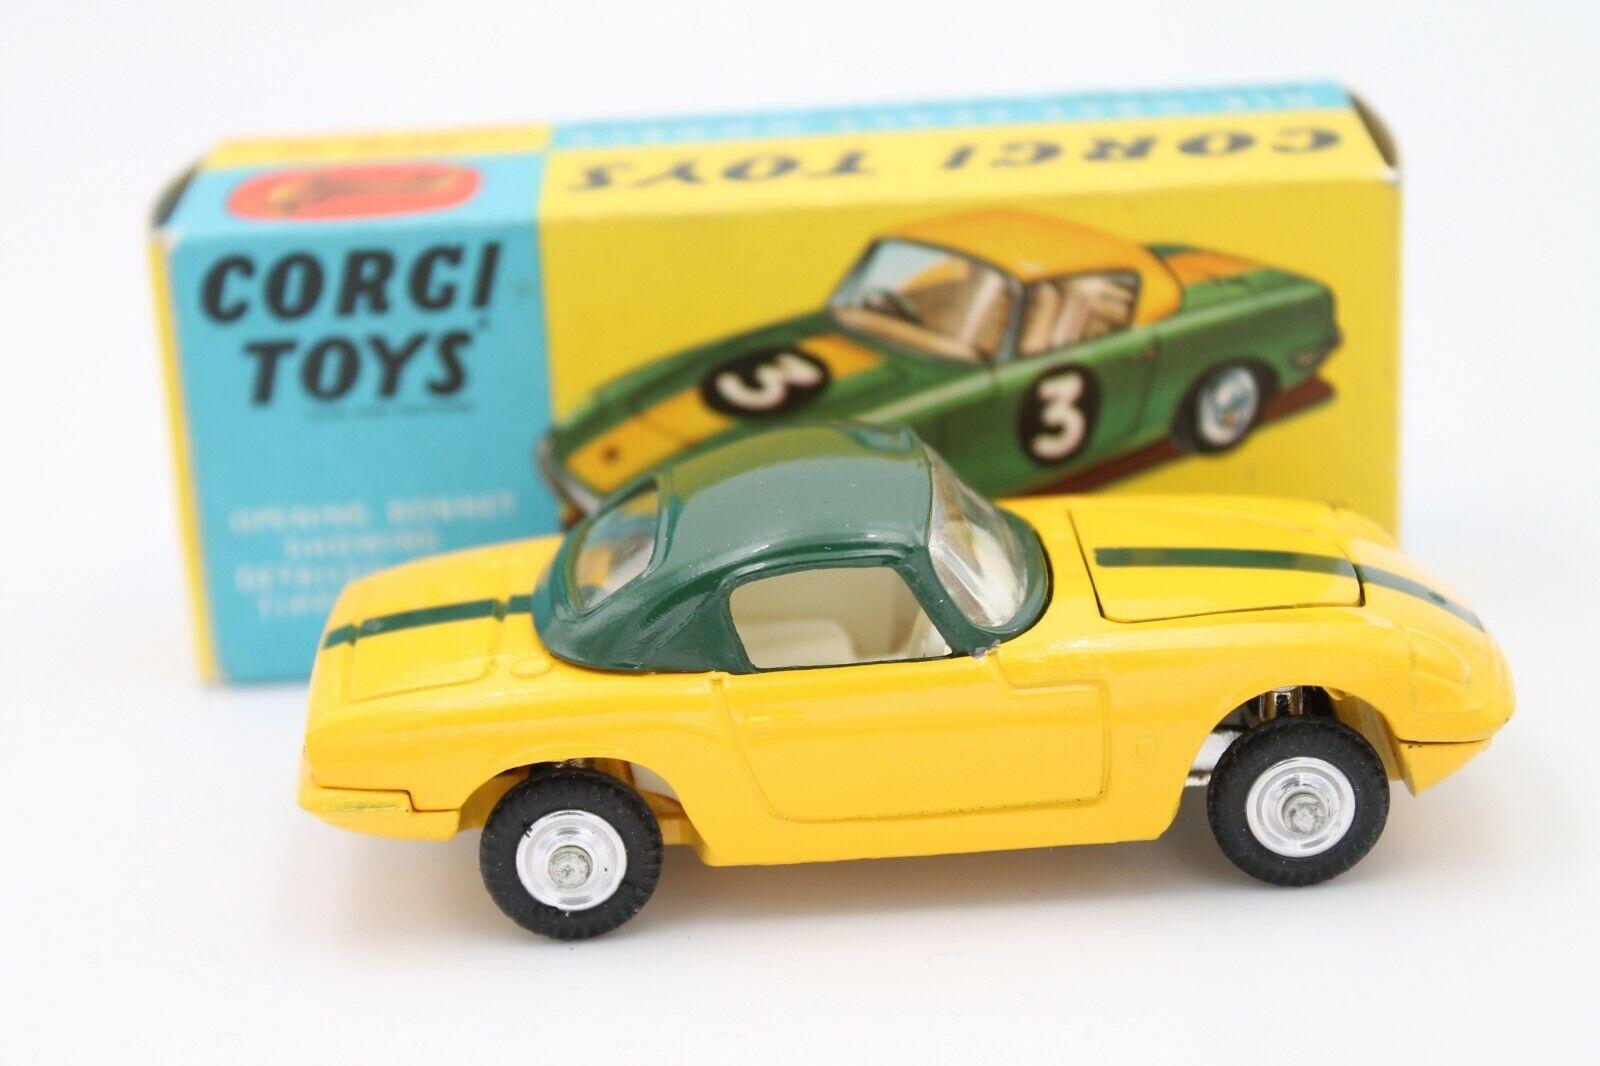 Corgi Juguetes 319  Lotus Elan hardtop amarillo verde  1 43  leaflet  OVP